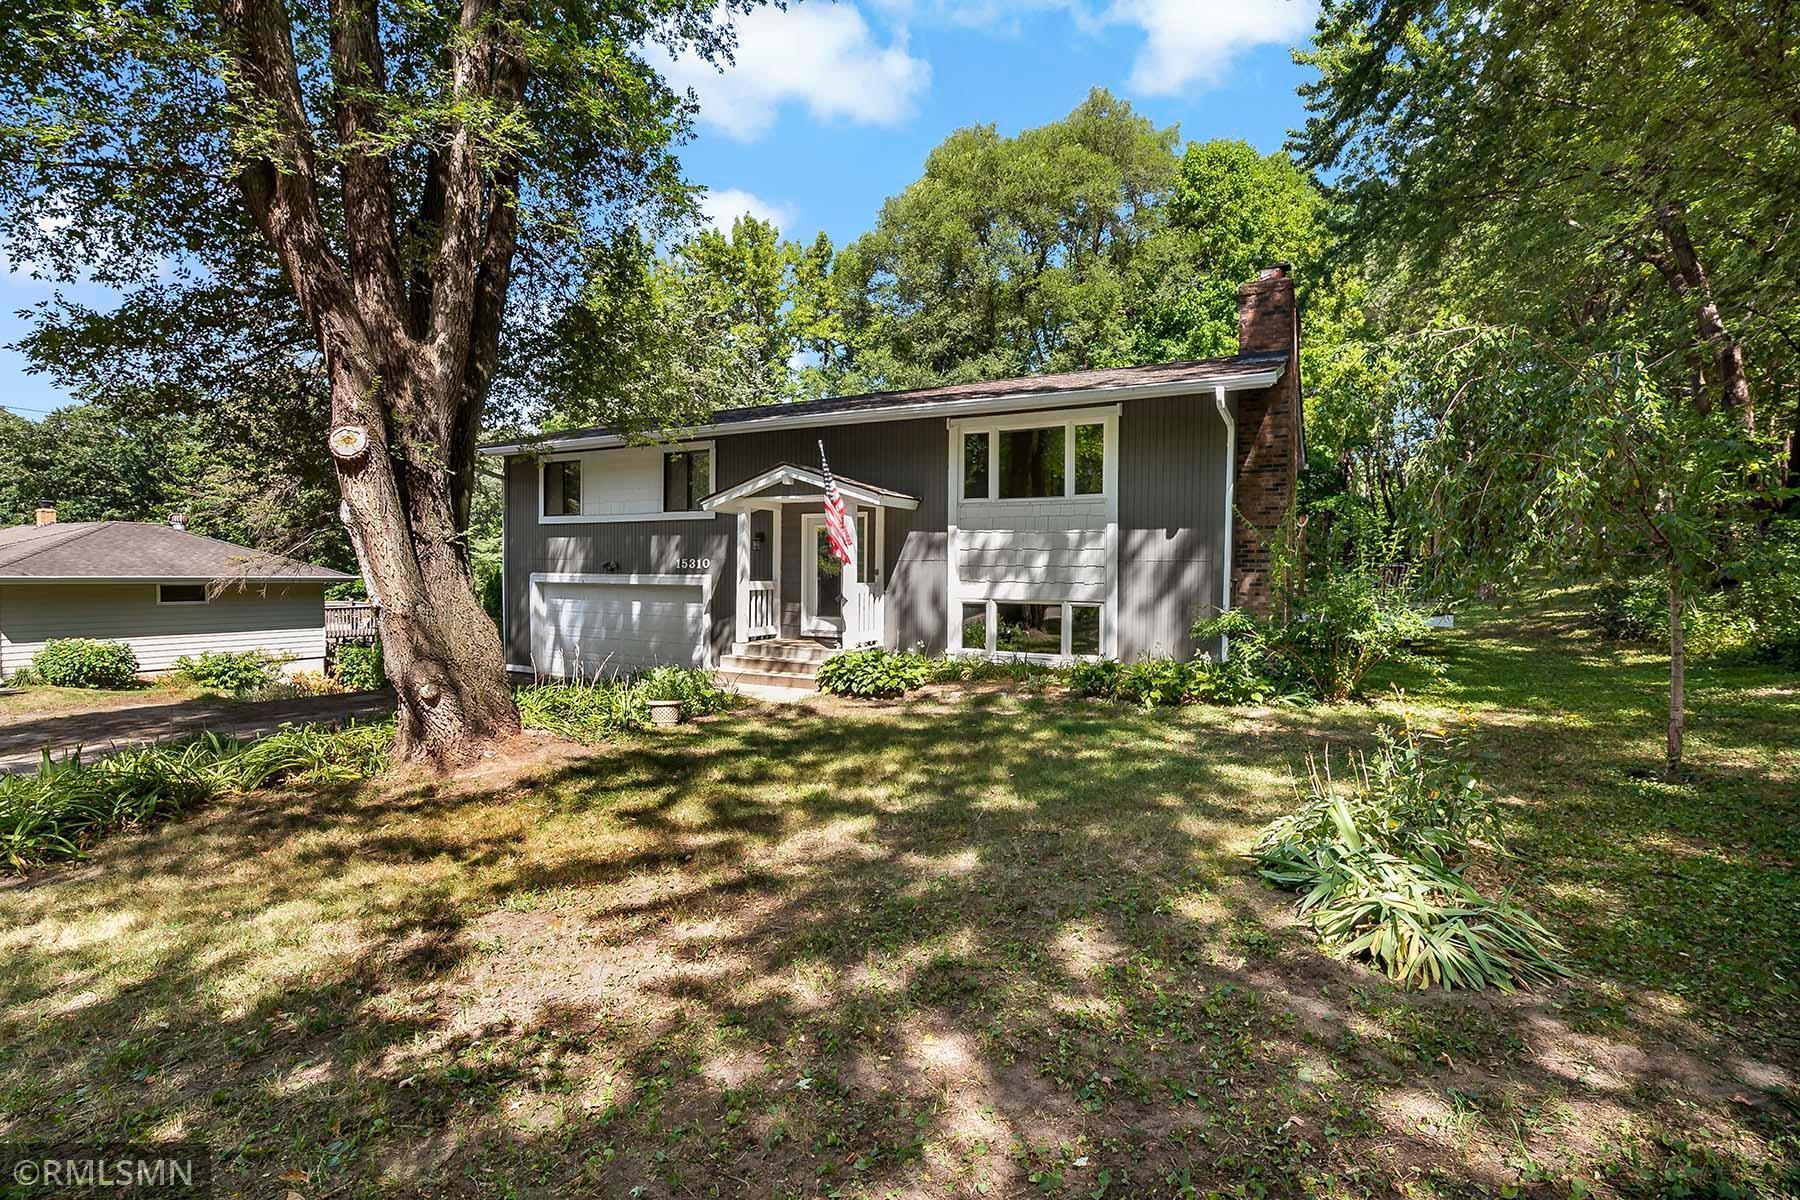 15310 Lake Street Extension, Minnetonka, MN 55345